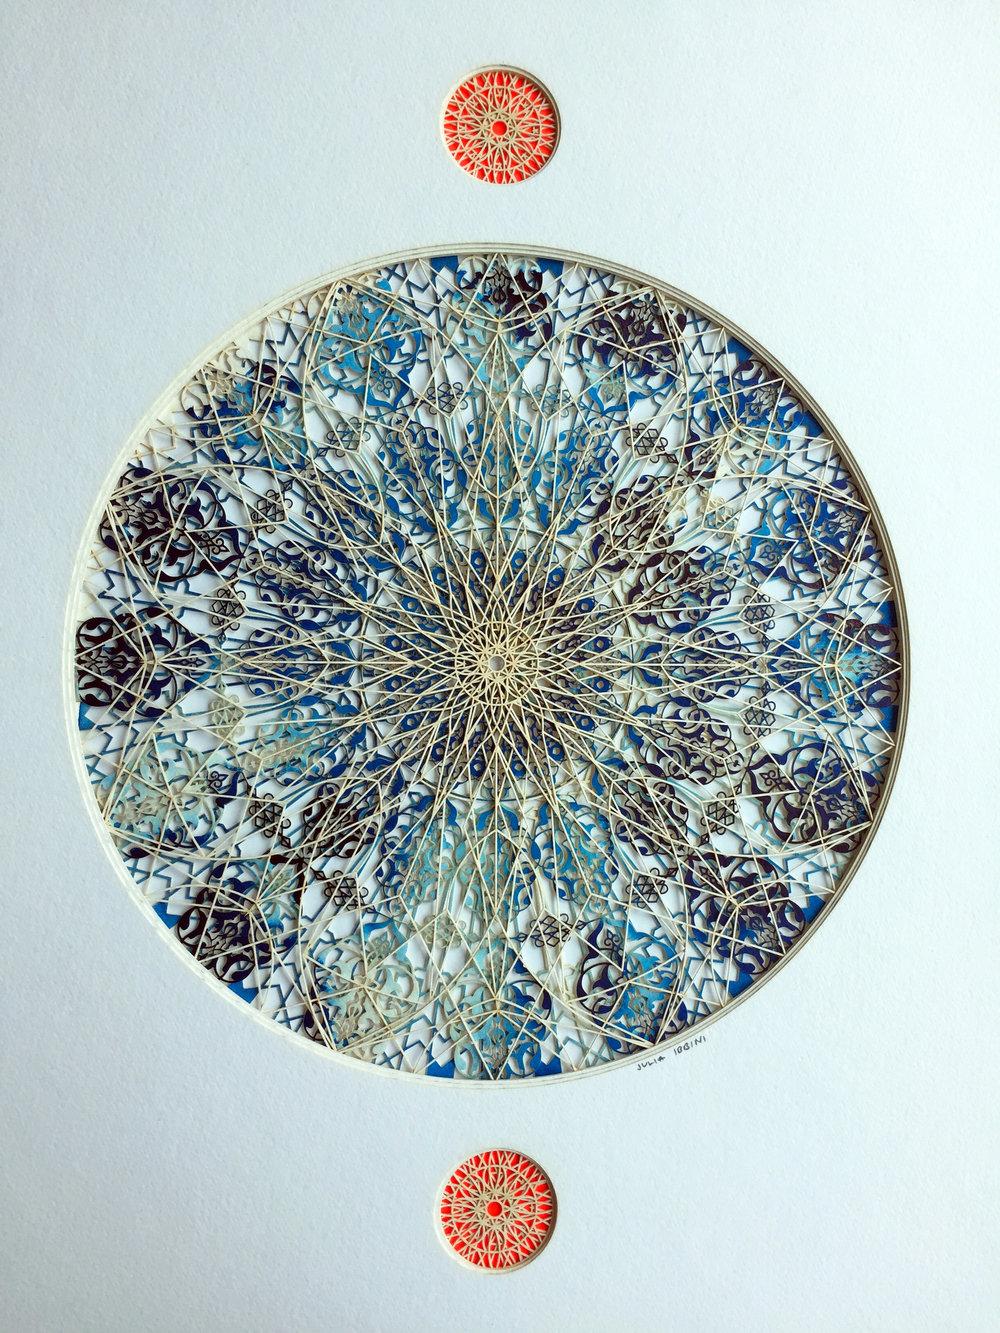 Julia Ibbini,  Araq Fades (Circle Studies) , 2017, 19 x 15 x 1.5 inches framed, photo courtesy of the artist